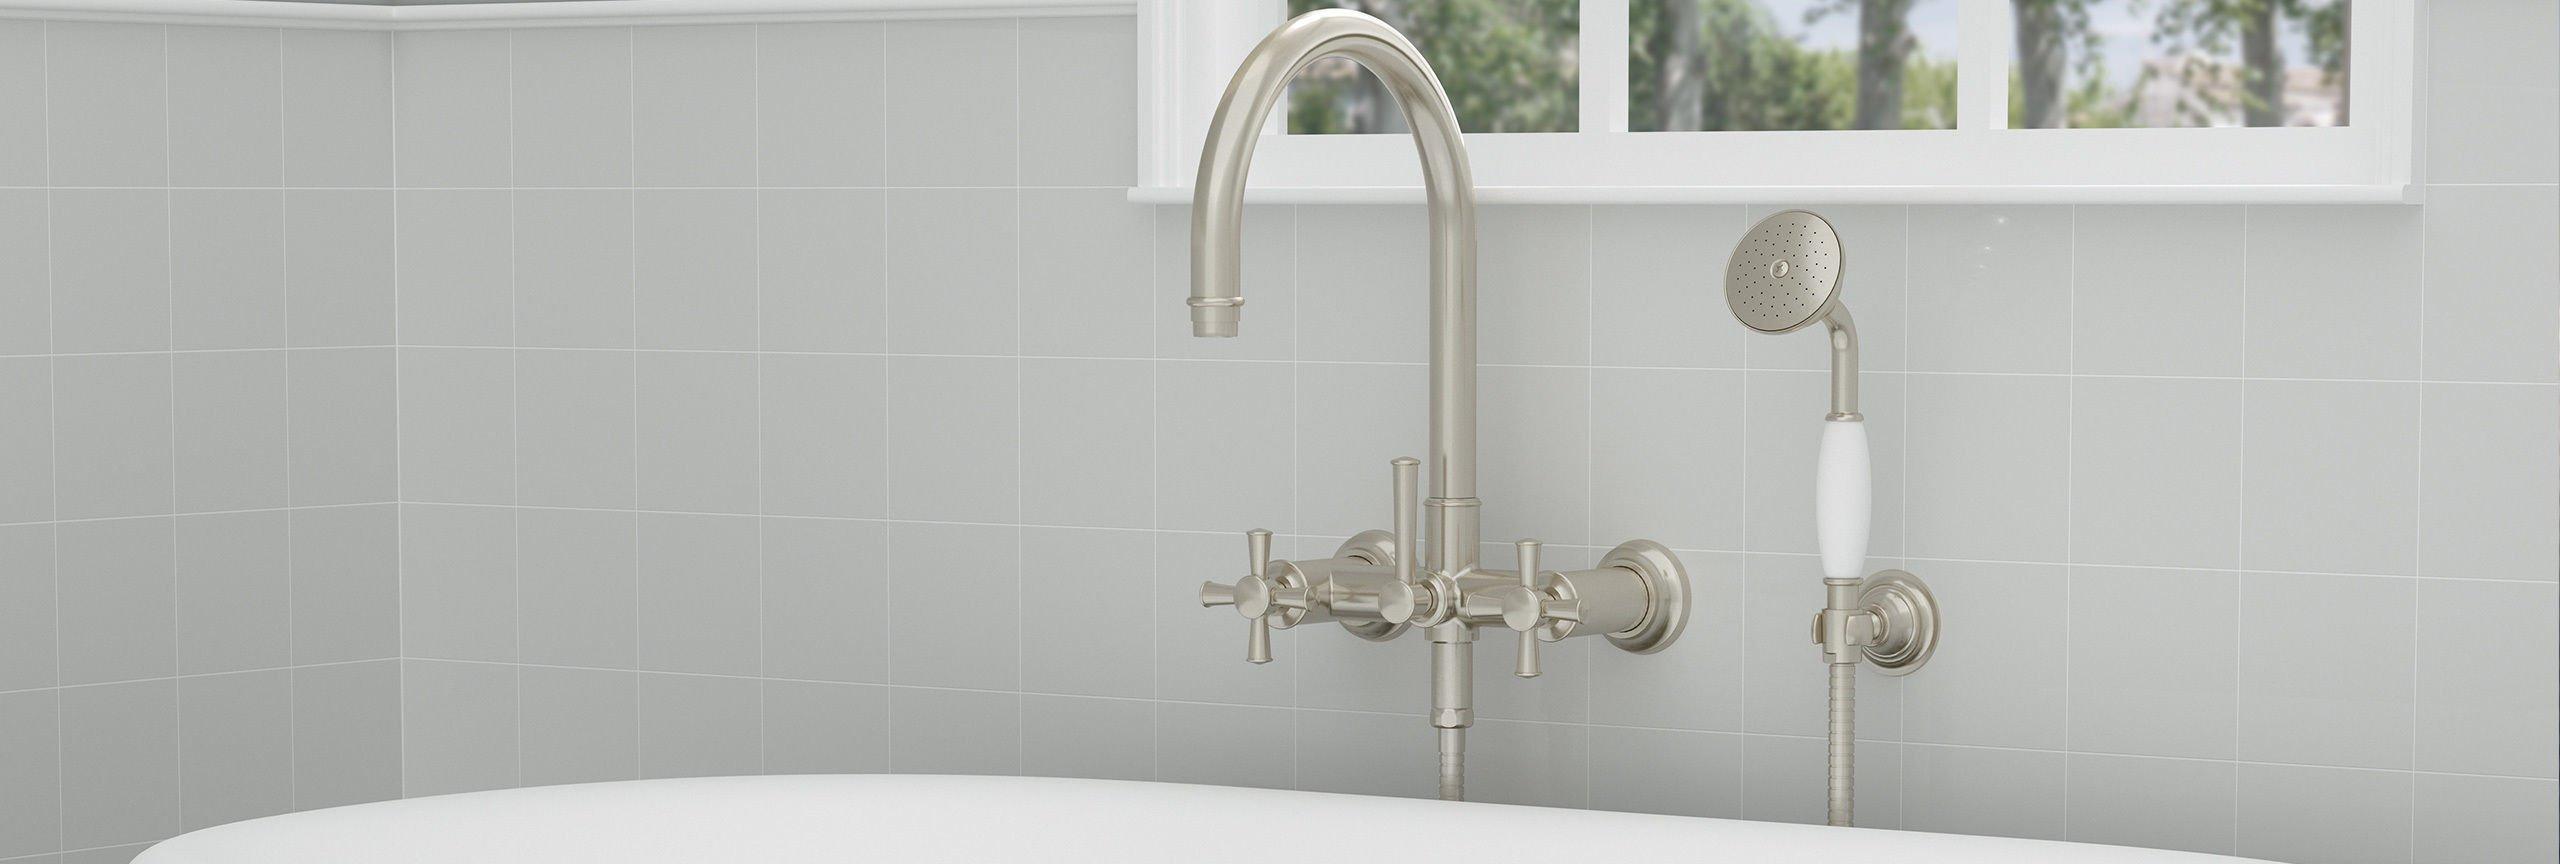 Bathroom series Palomar tub filler wall mount over tub